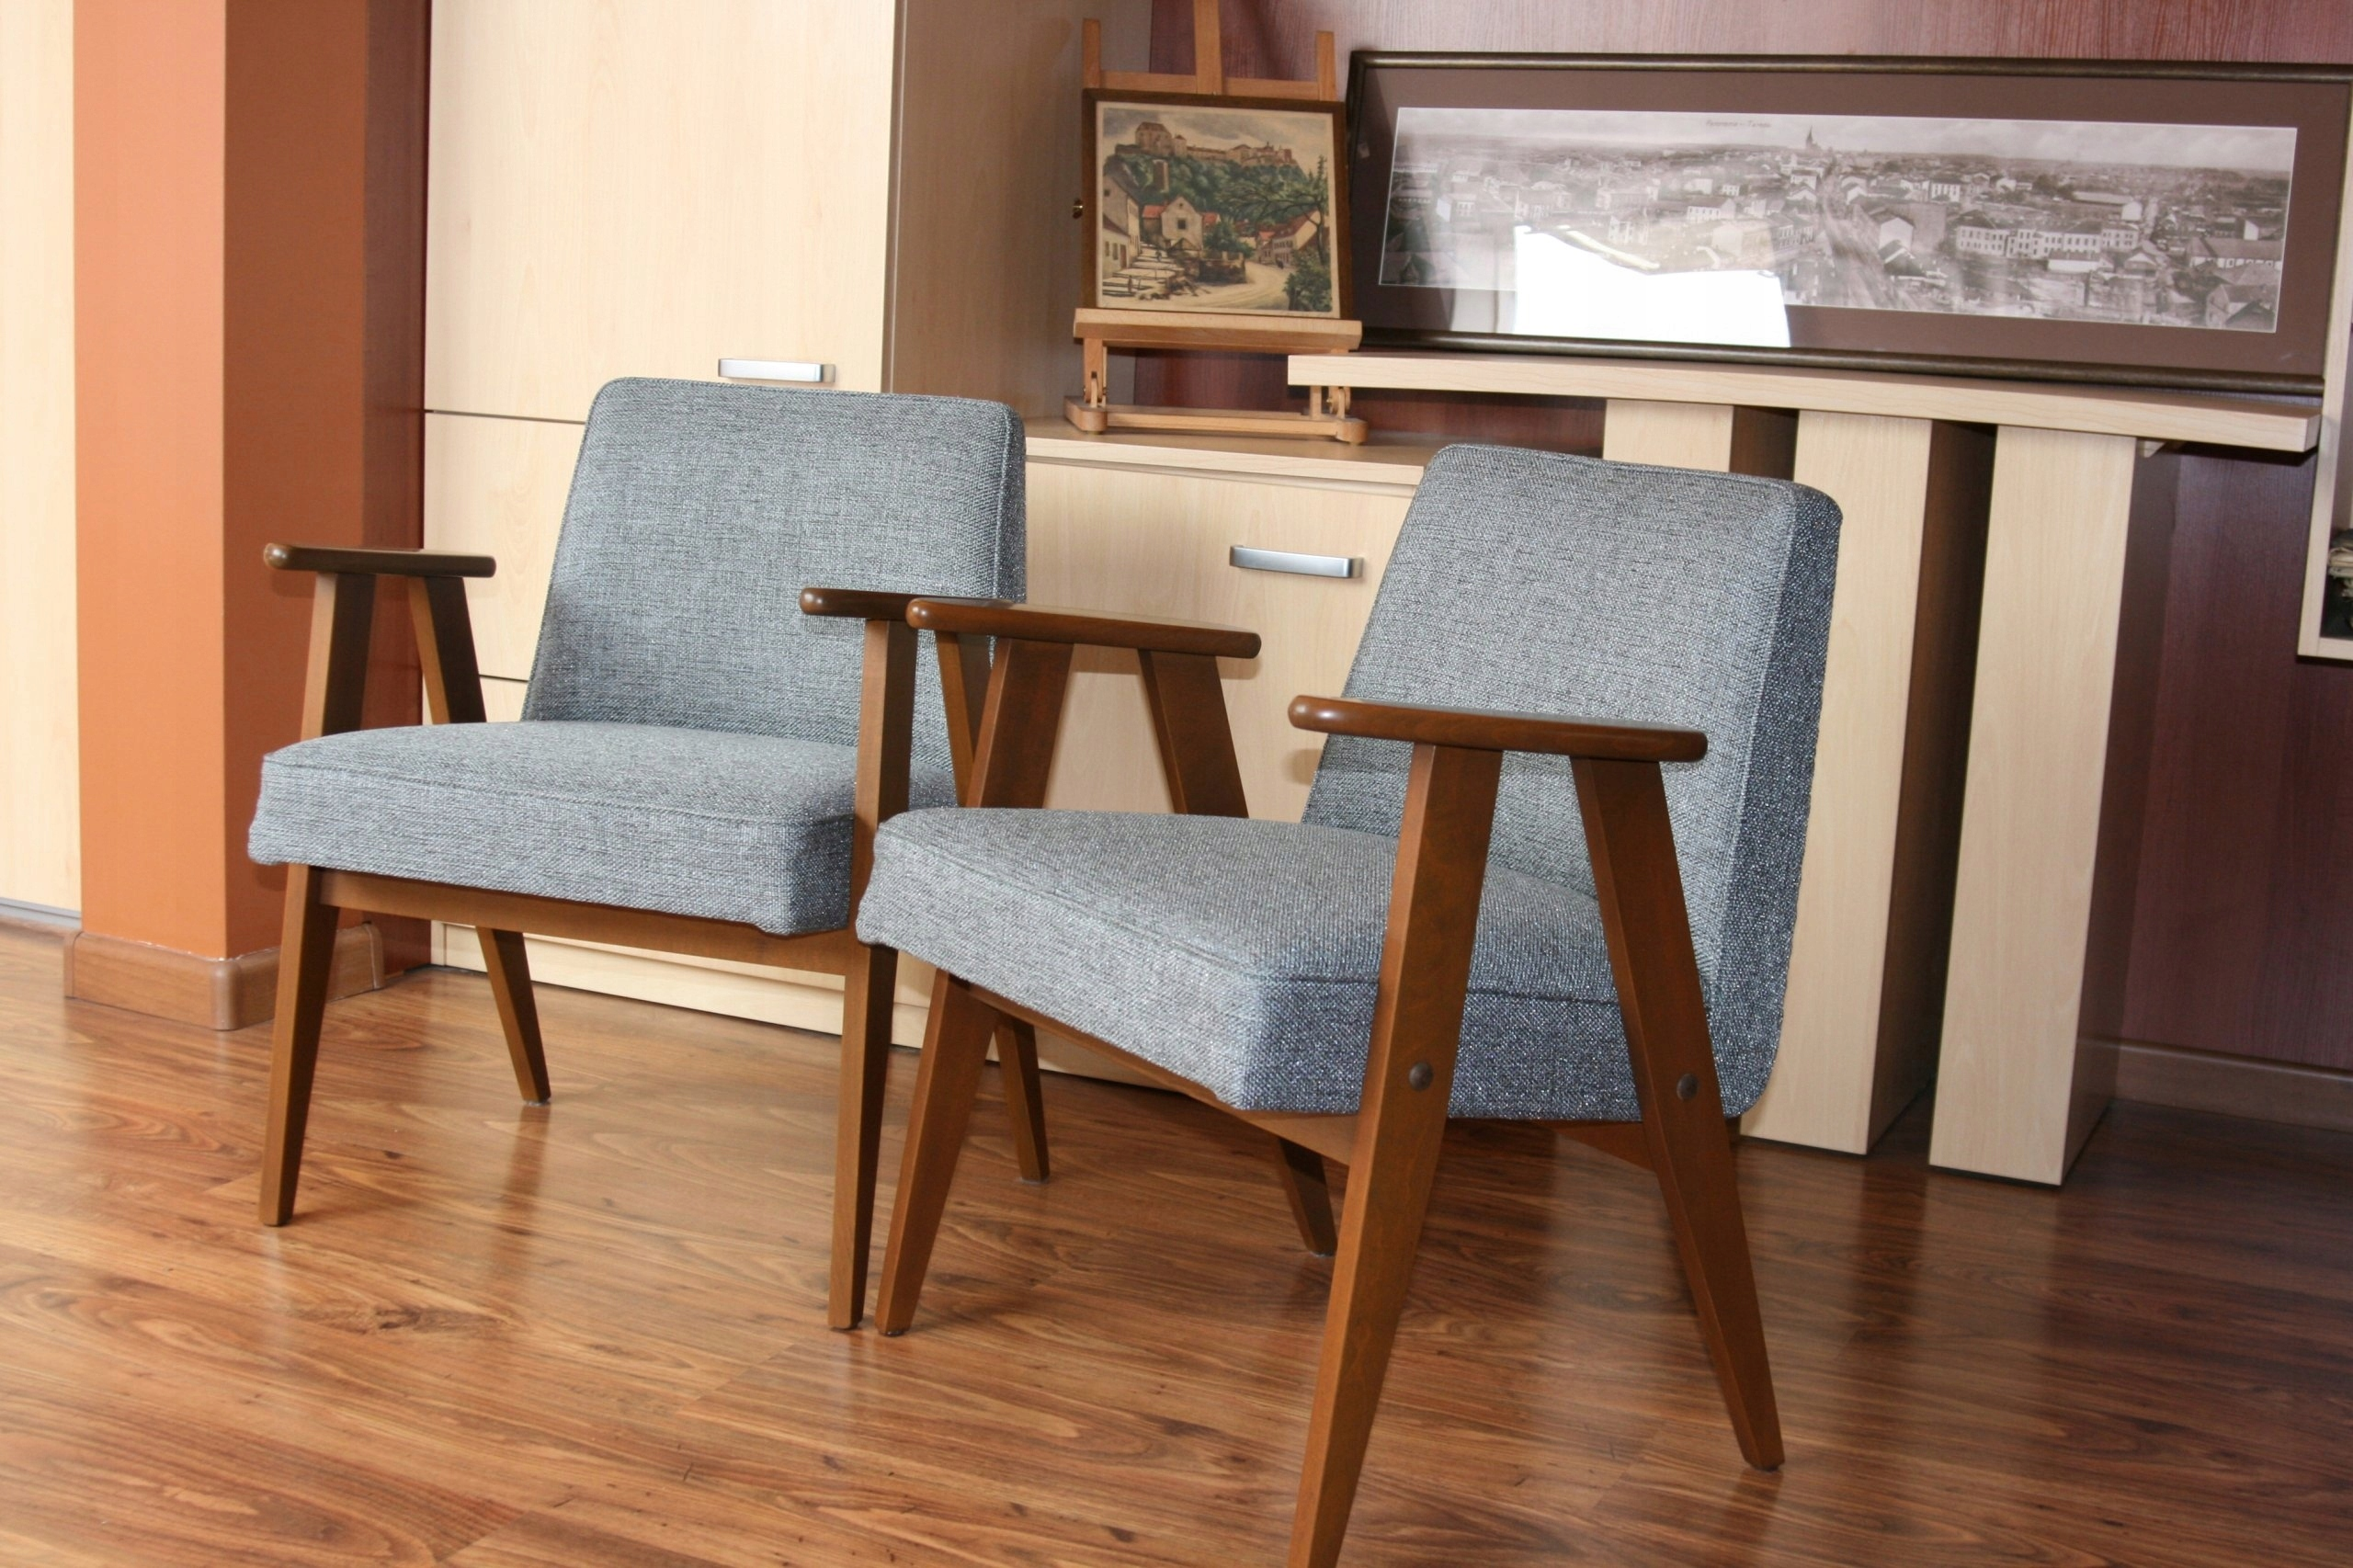 2 Fotele 366 Projj Chierowskipolska Lata 60 Xxw